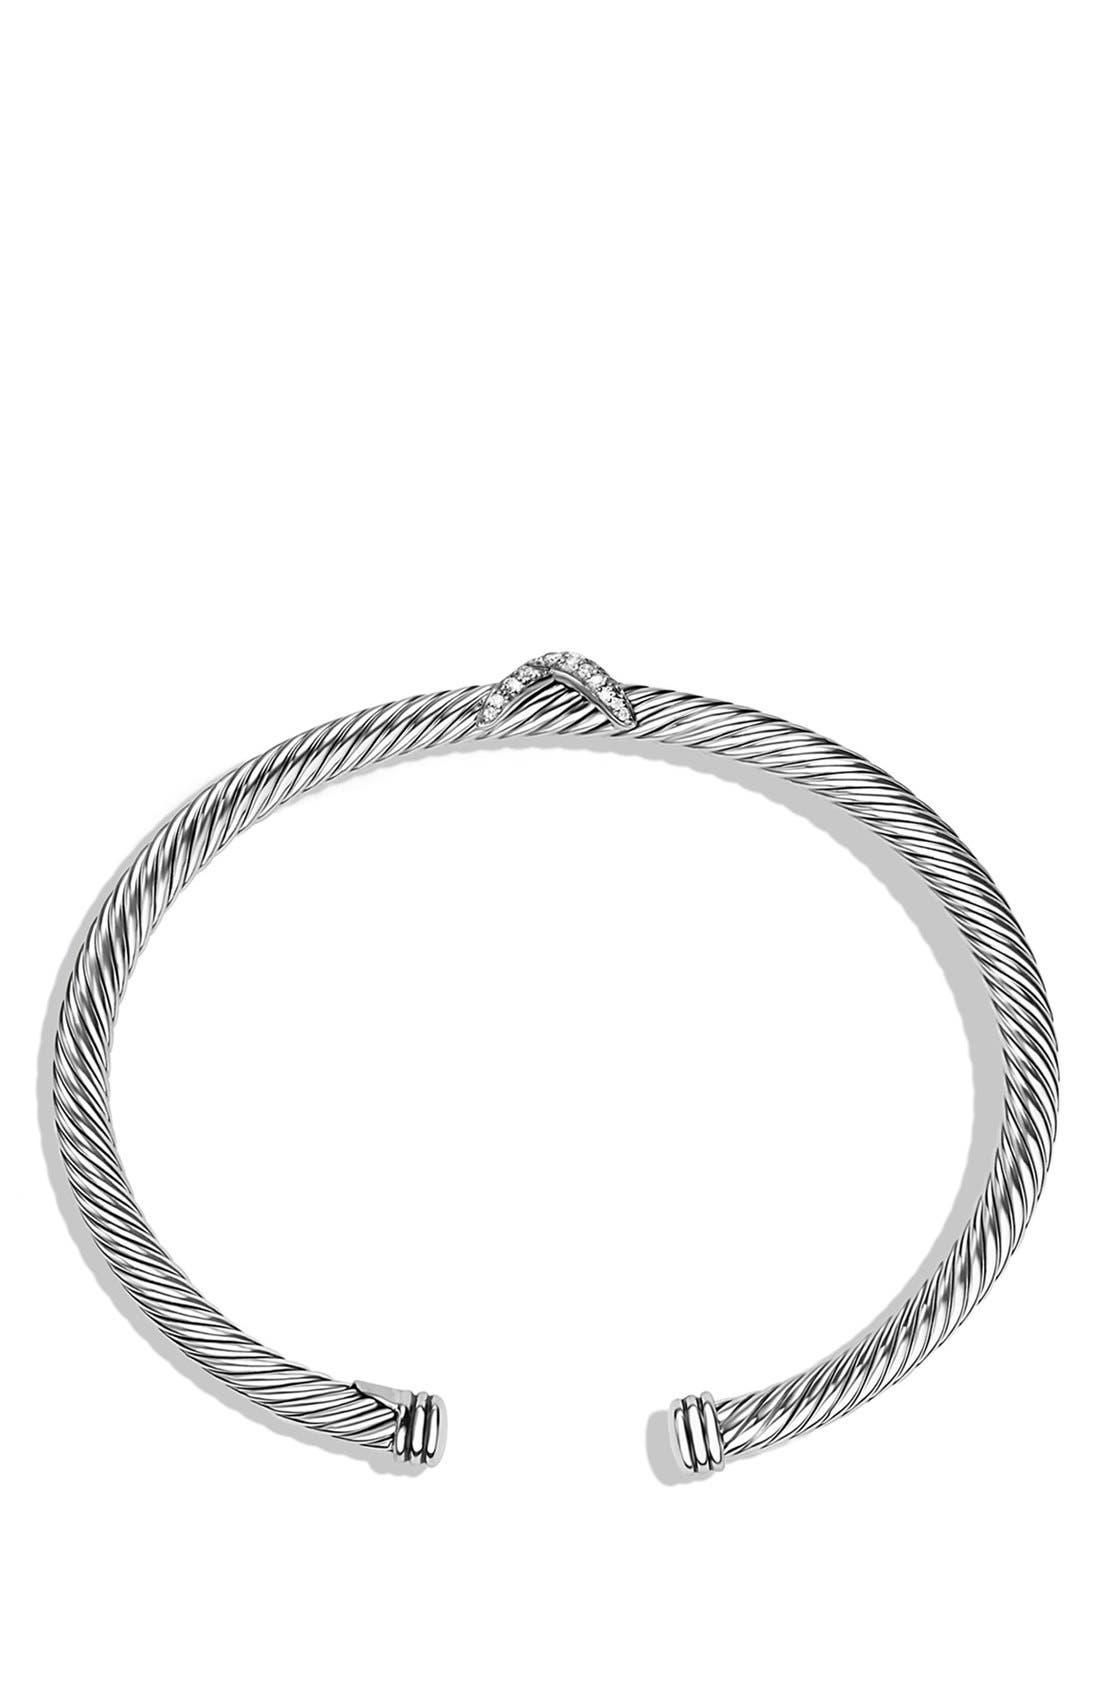 'X' Bracelet with Diamonds,                             Alternate thumbnail 2, color,                             Diamond